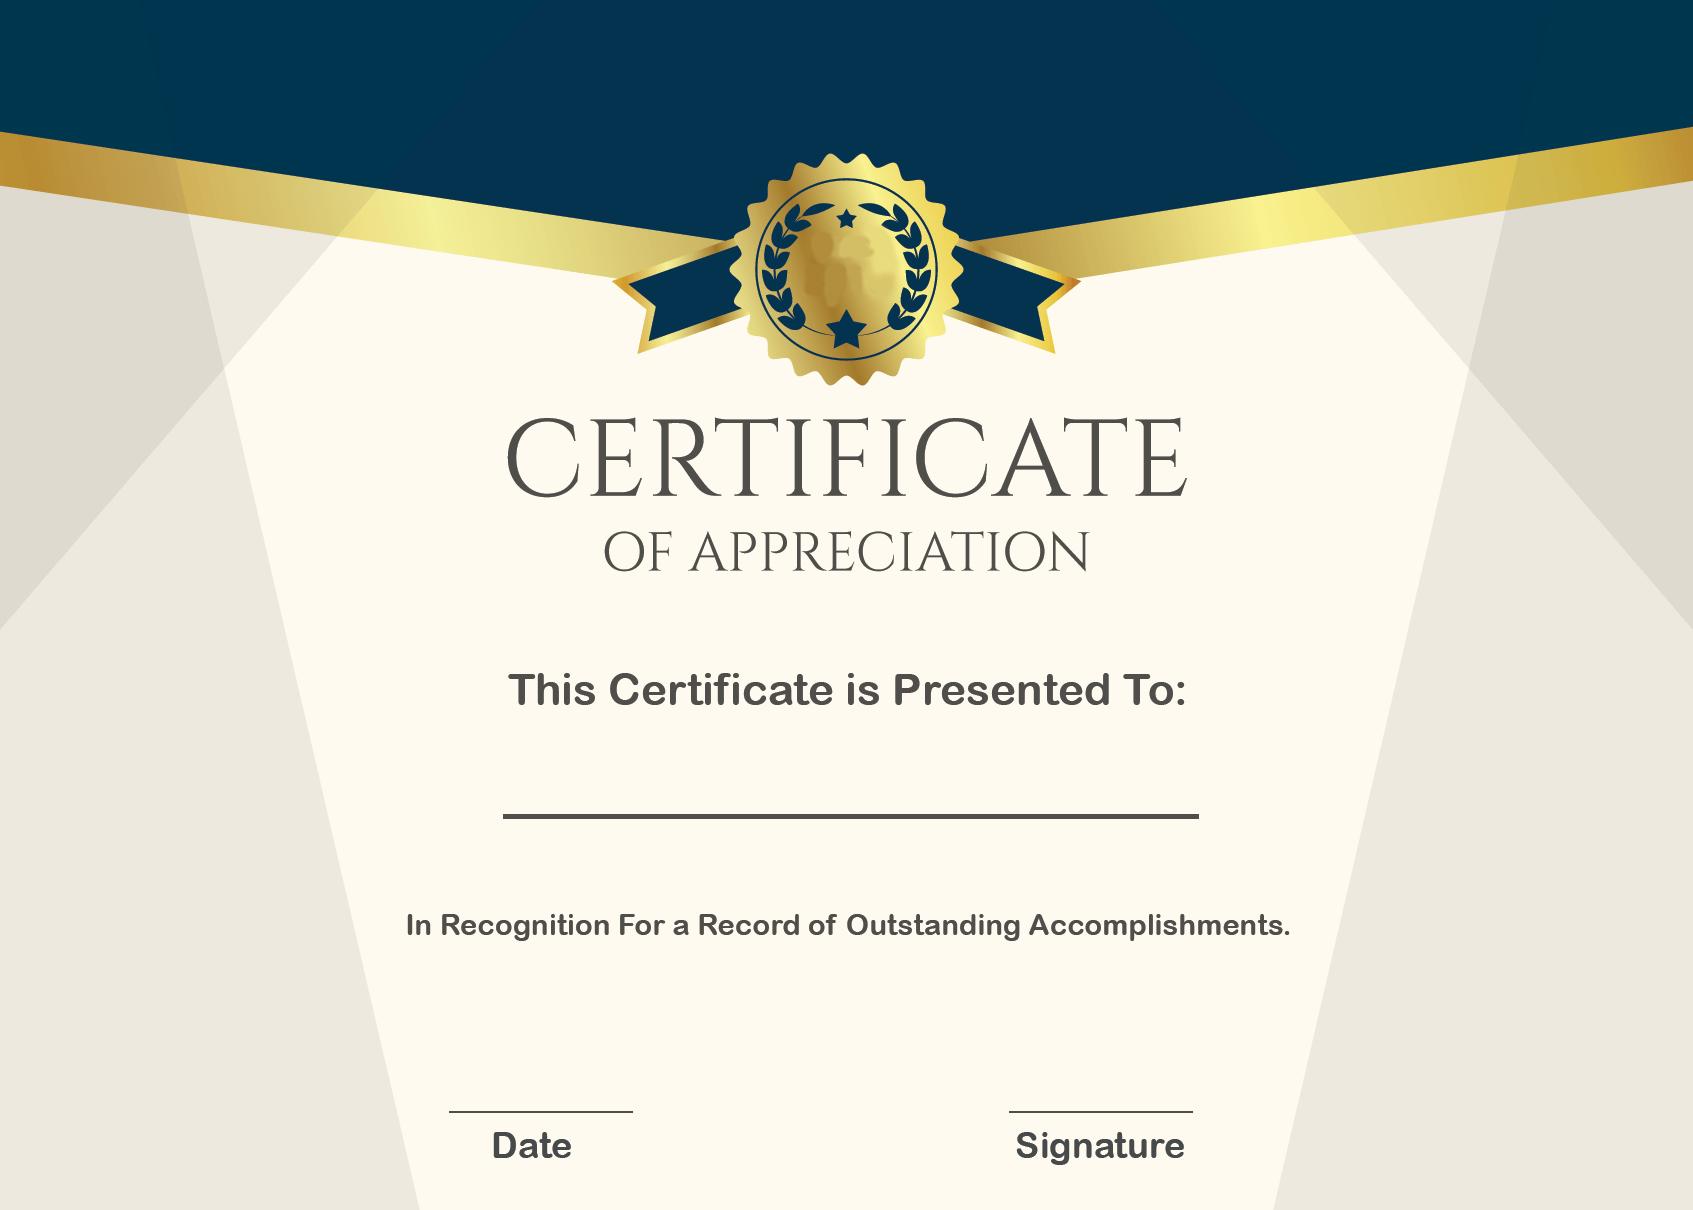 Certificate of Appreciation Wording Example